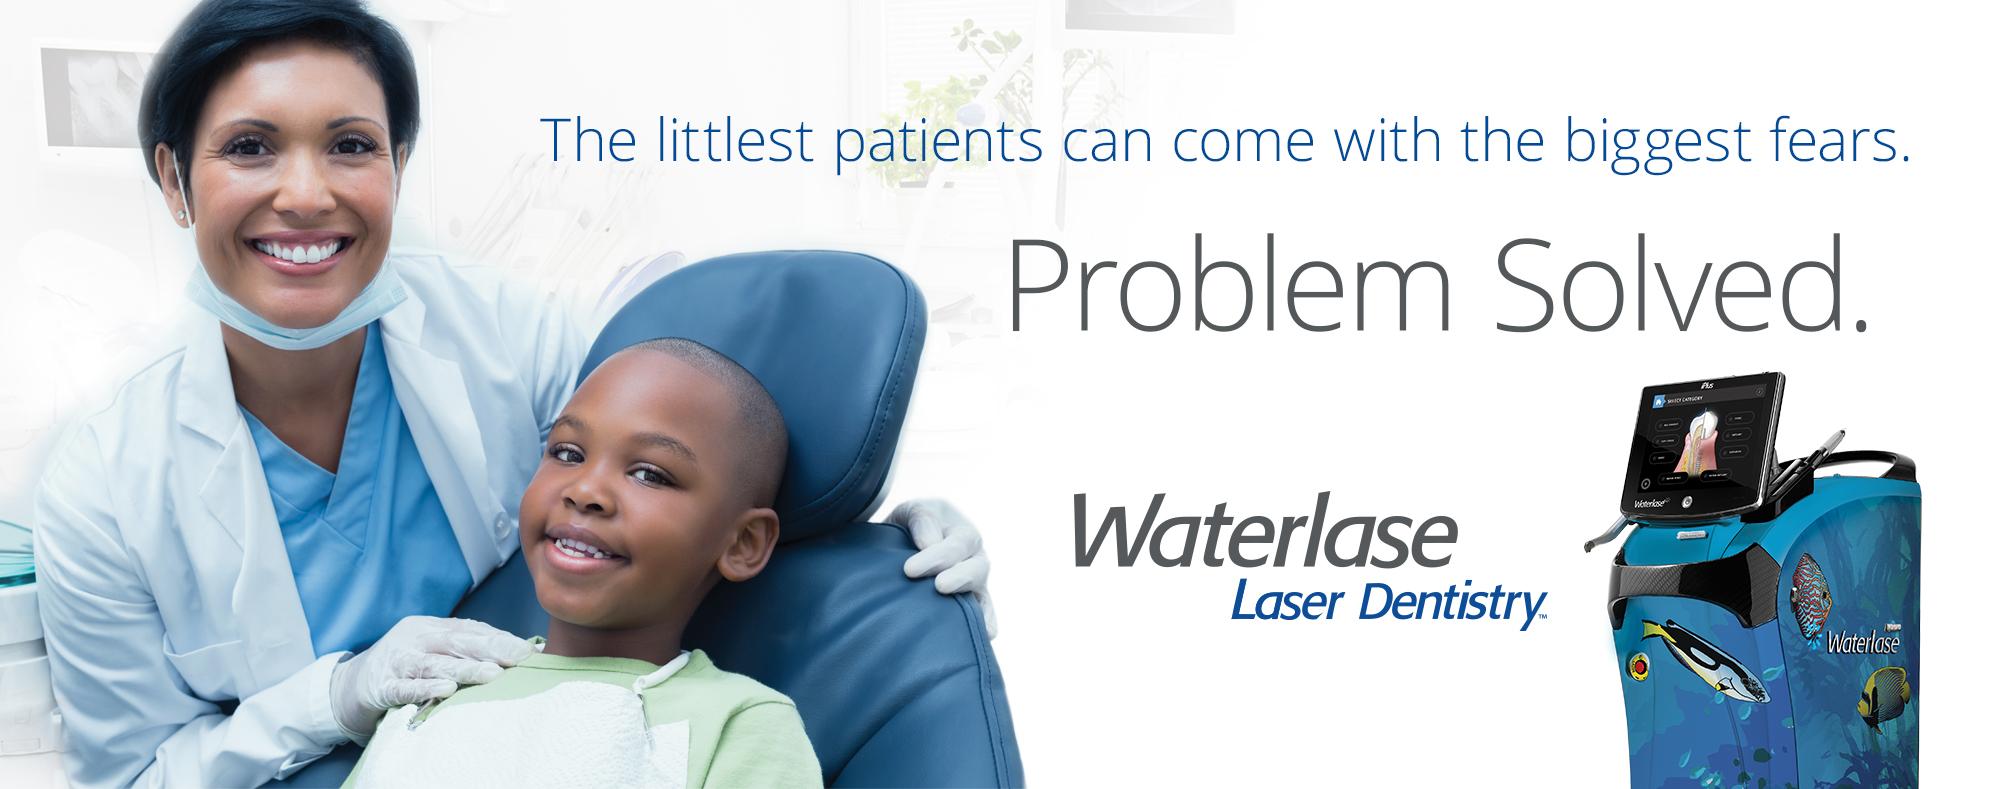 Waterlase Laser Dentistry